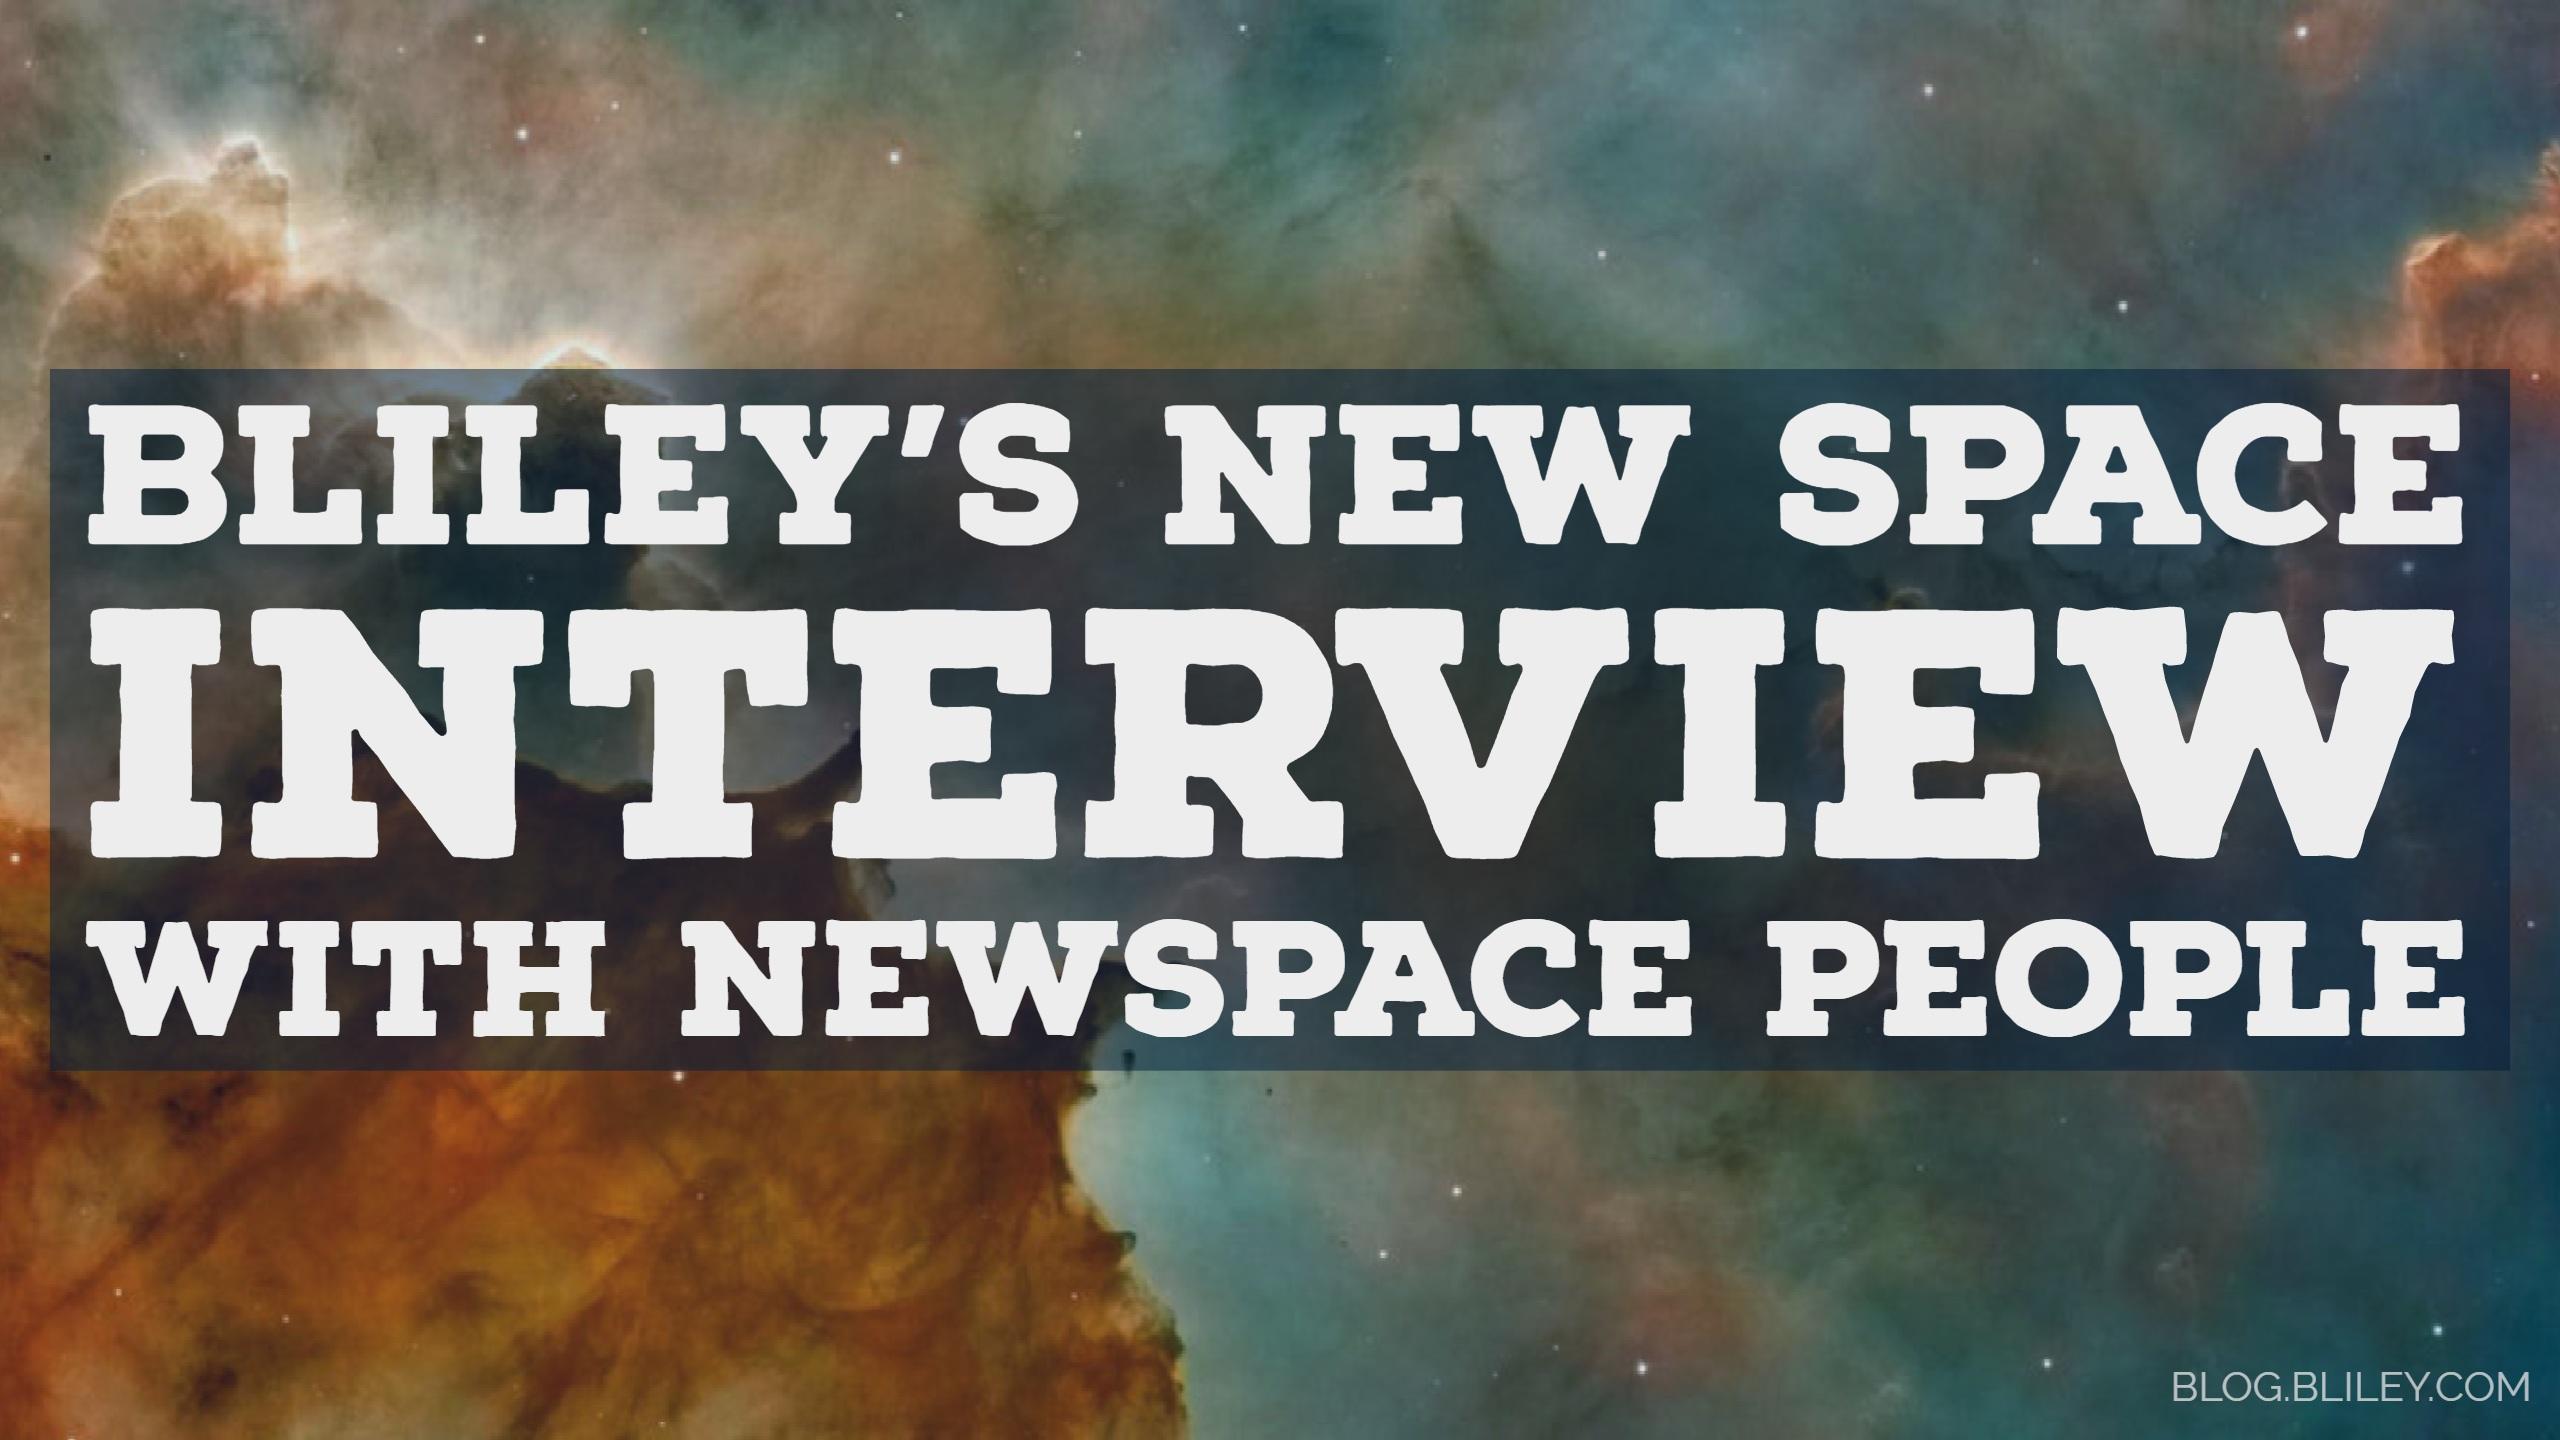 NewSpace People Interview.jpg